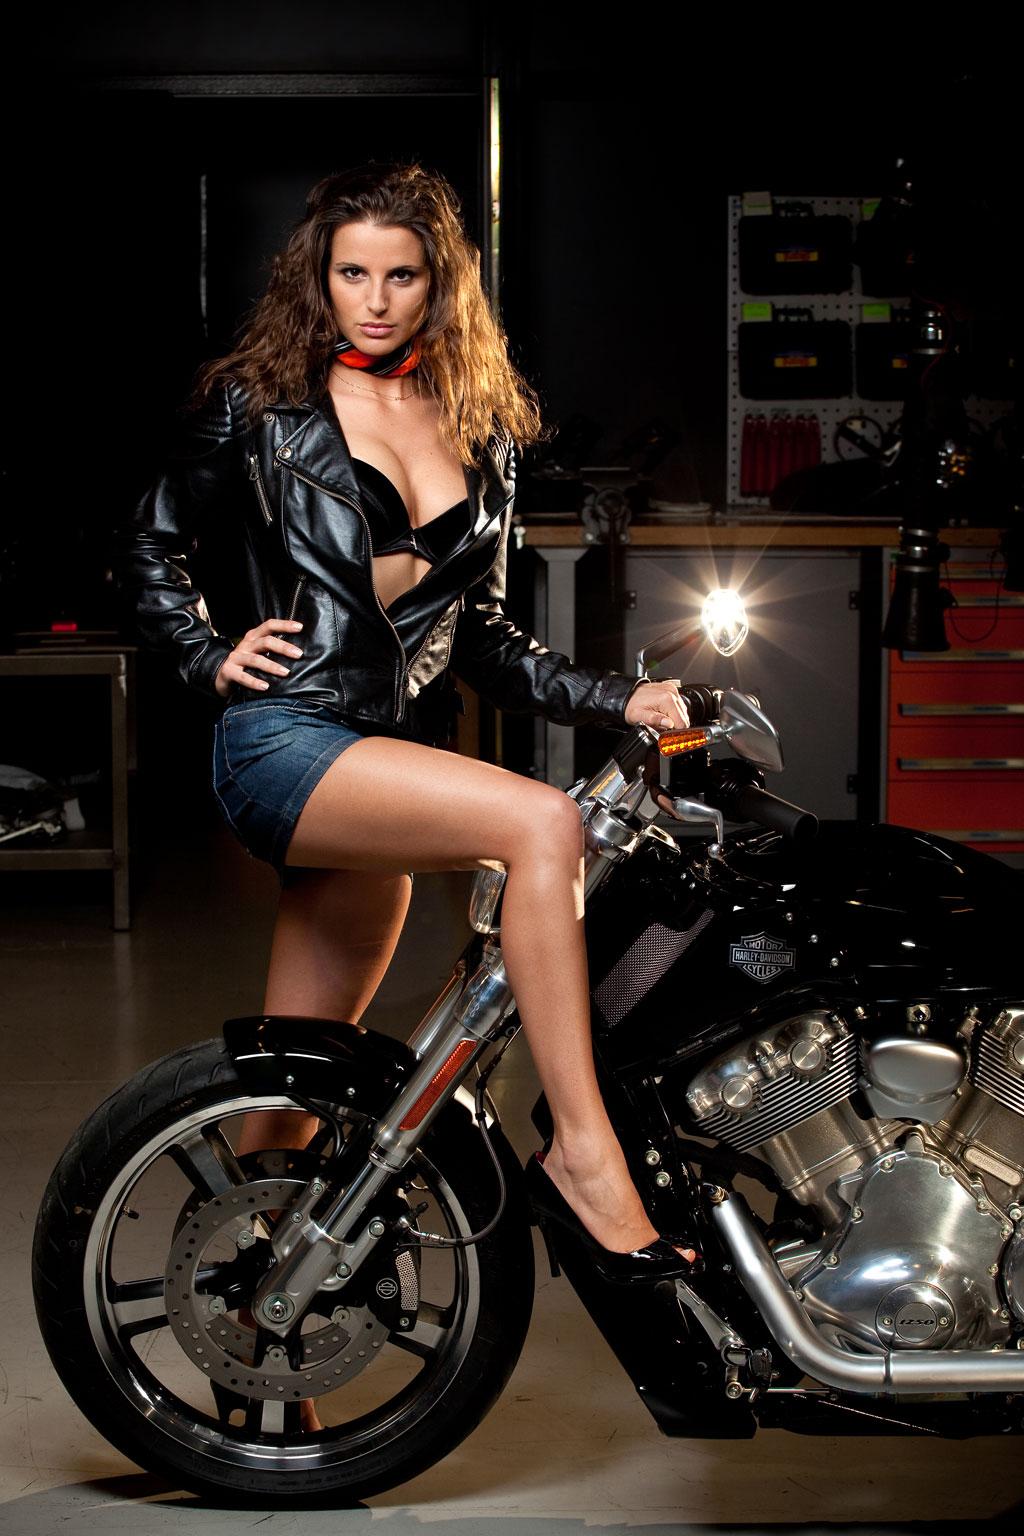 Pictures of biker babes